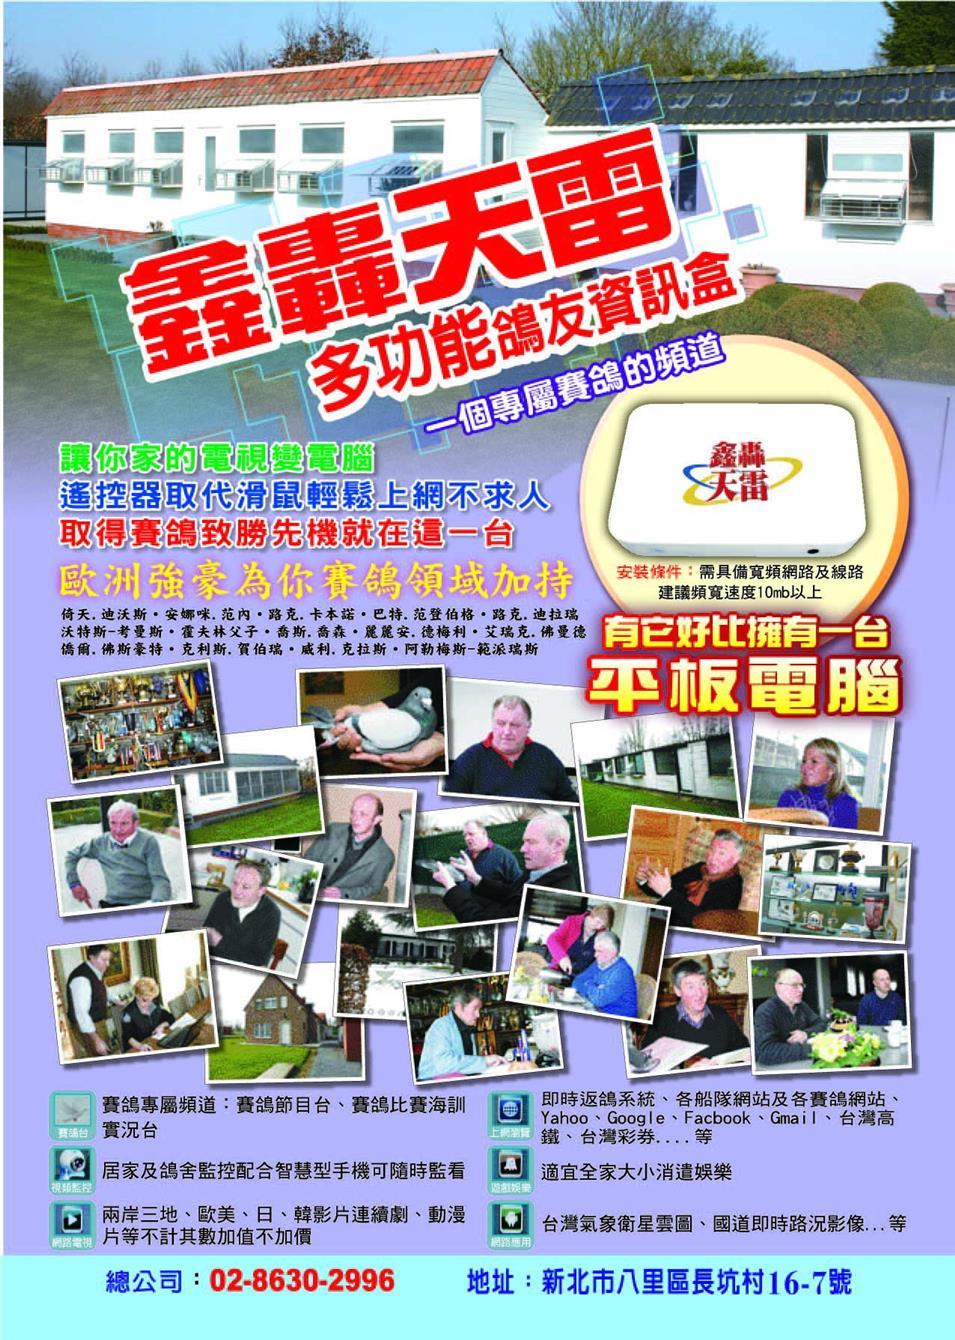 TV promotion02